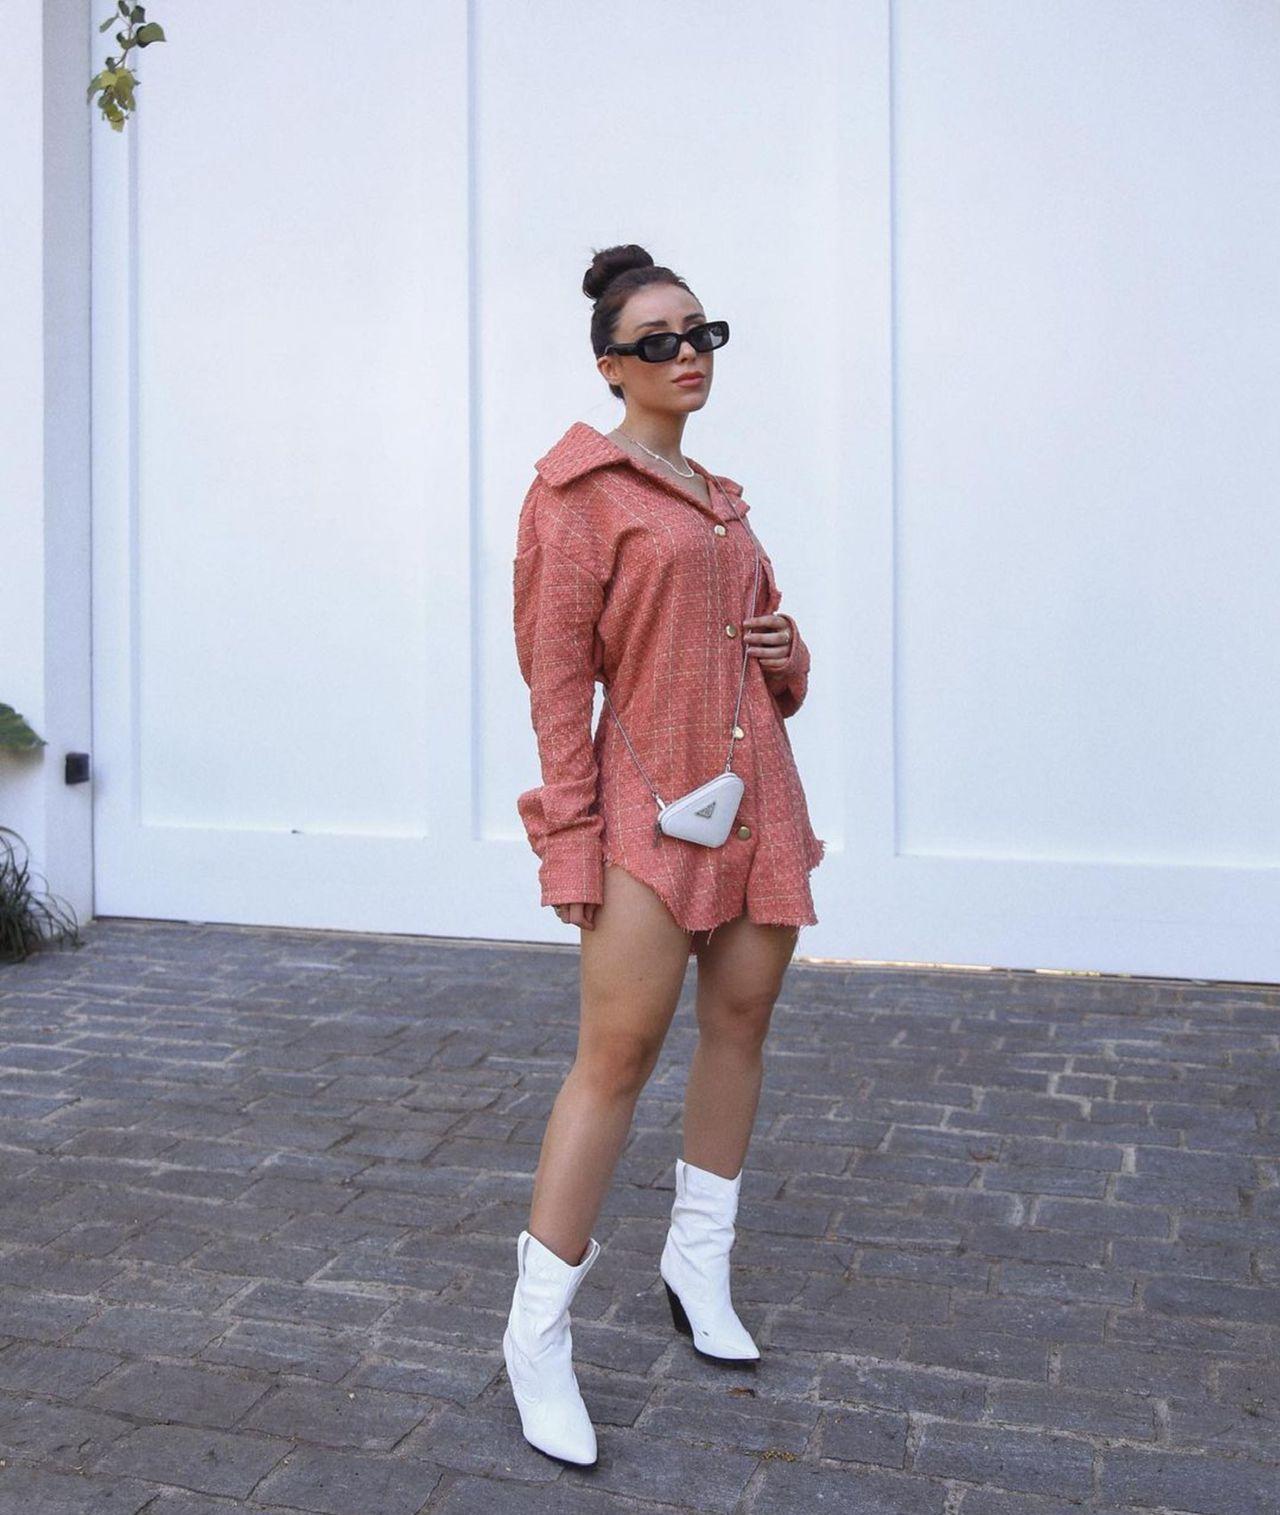 modelo sendo vestida pelo estilista Kaique Oliveira